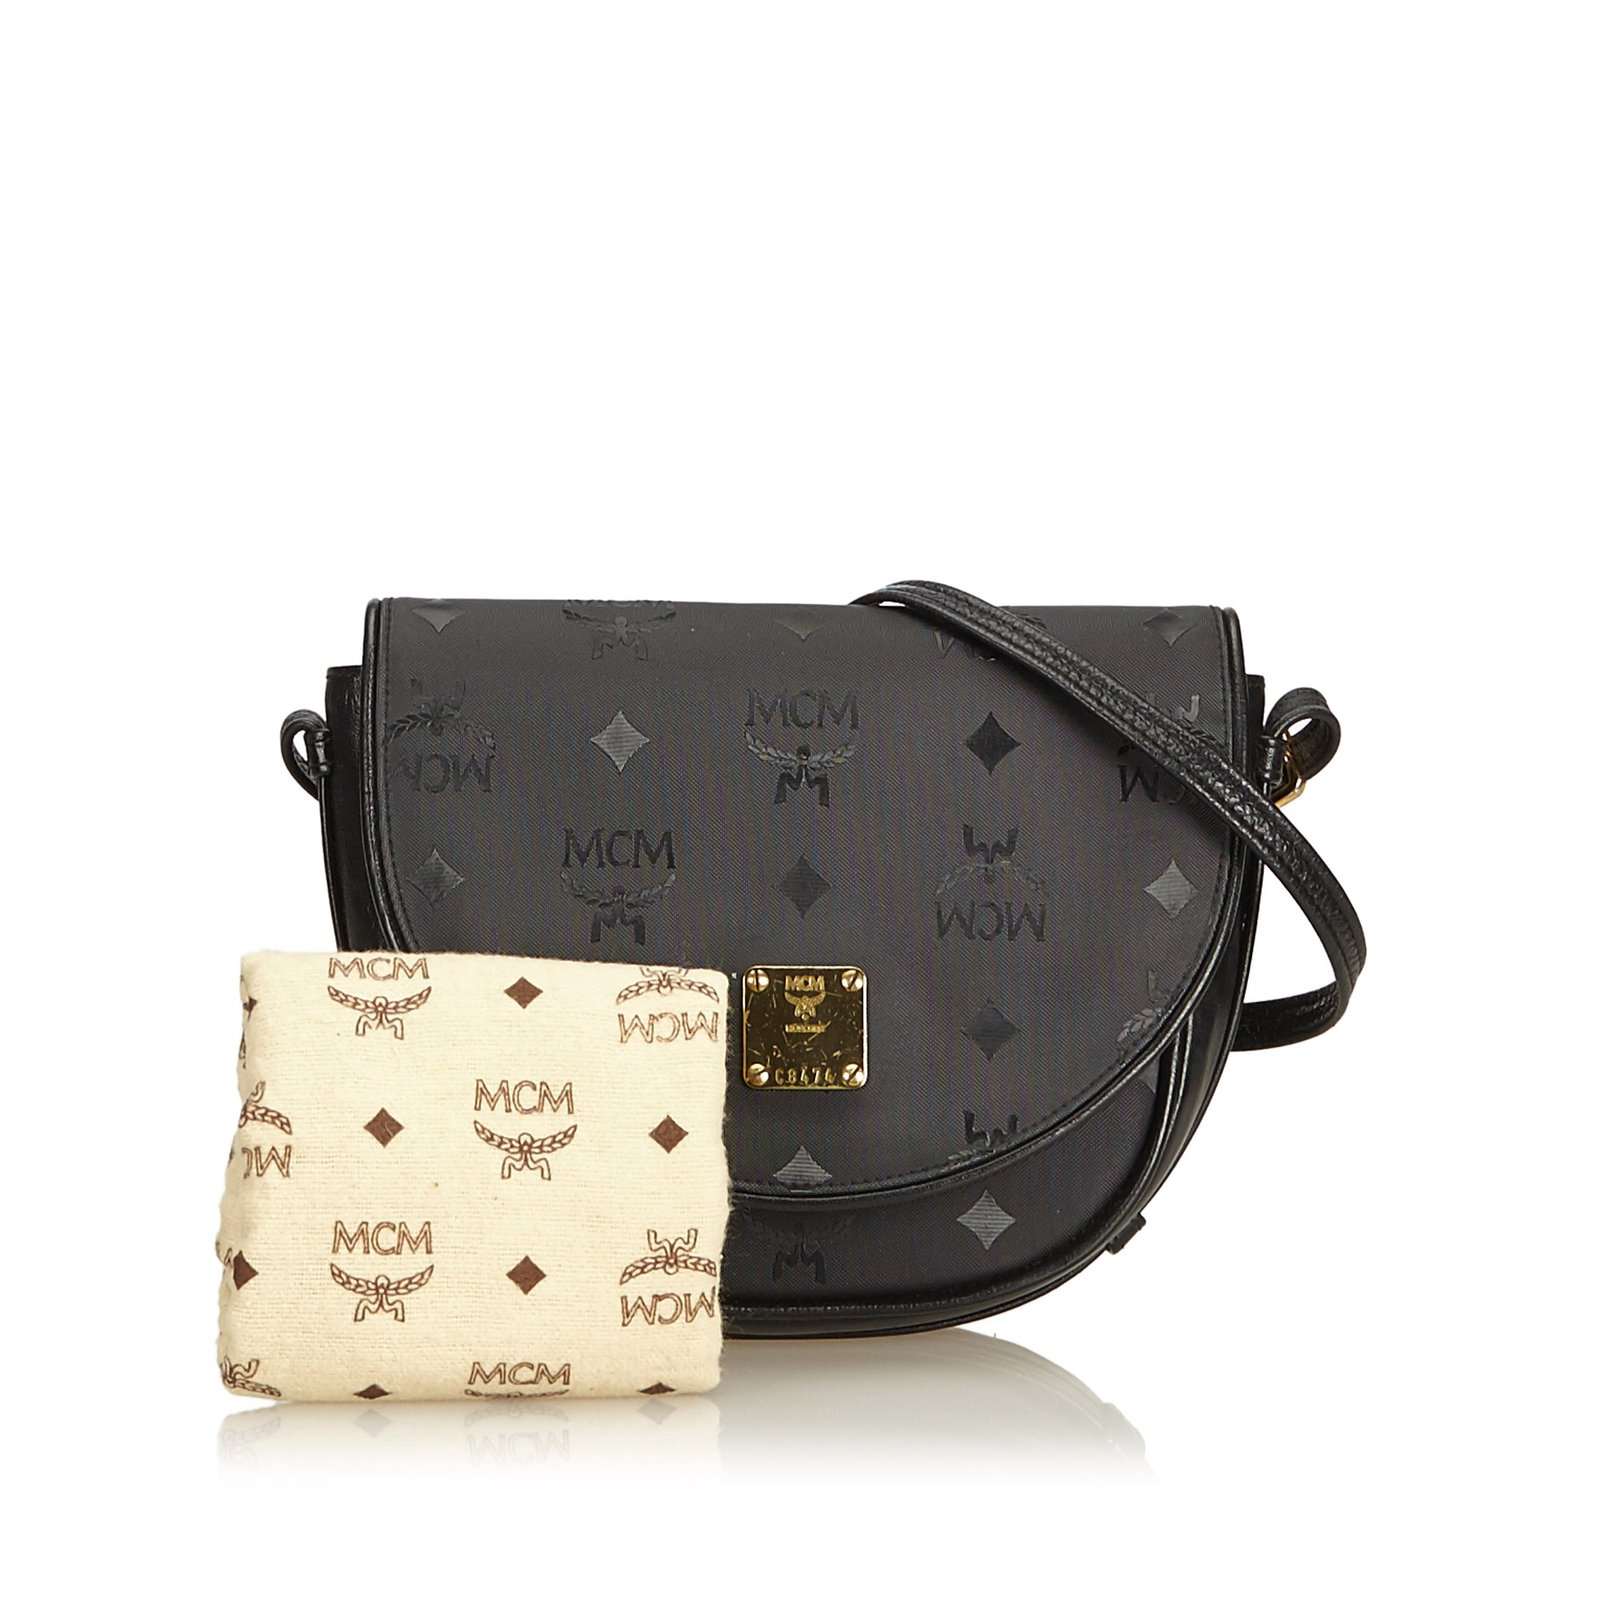 80a6099d9b MCM Visetos Canvas Crossbody Bag Handbags Leather,Other,Cloth,Cloth ...